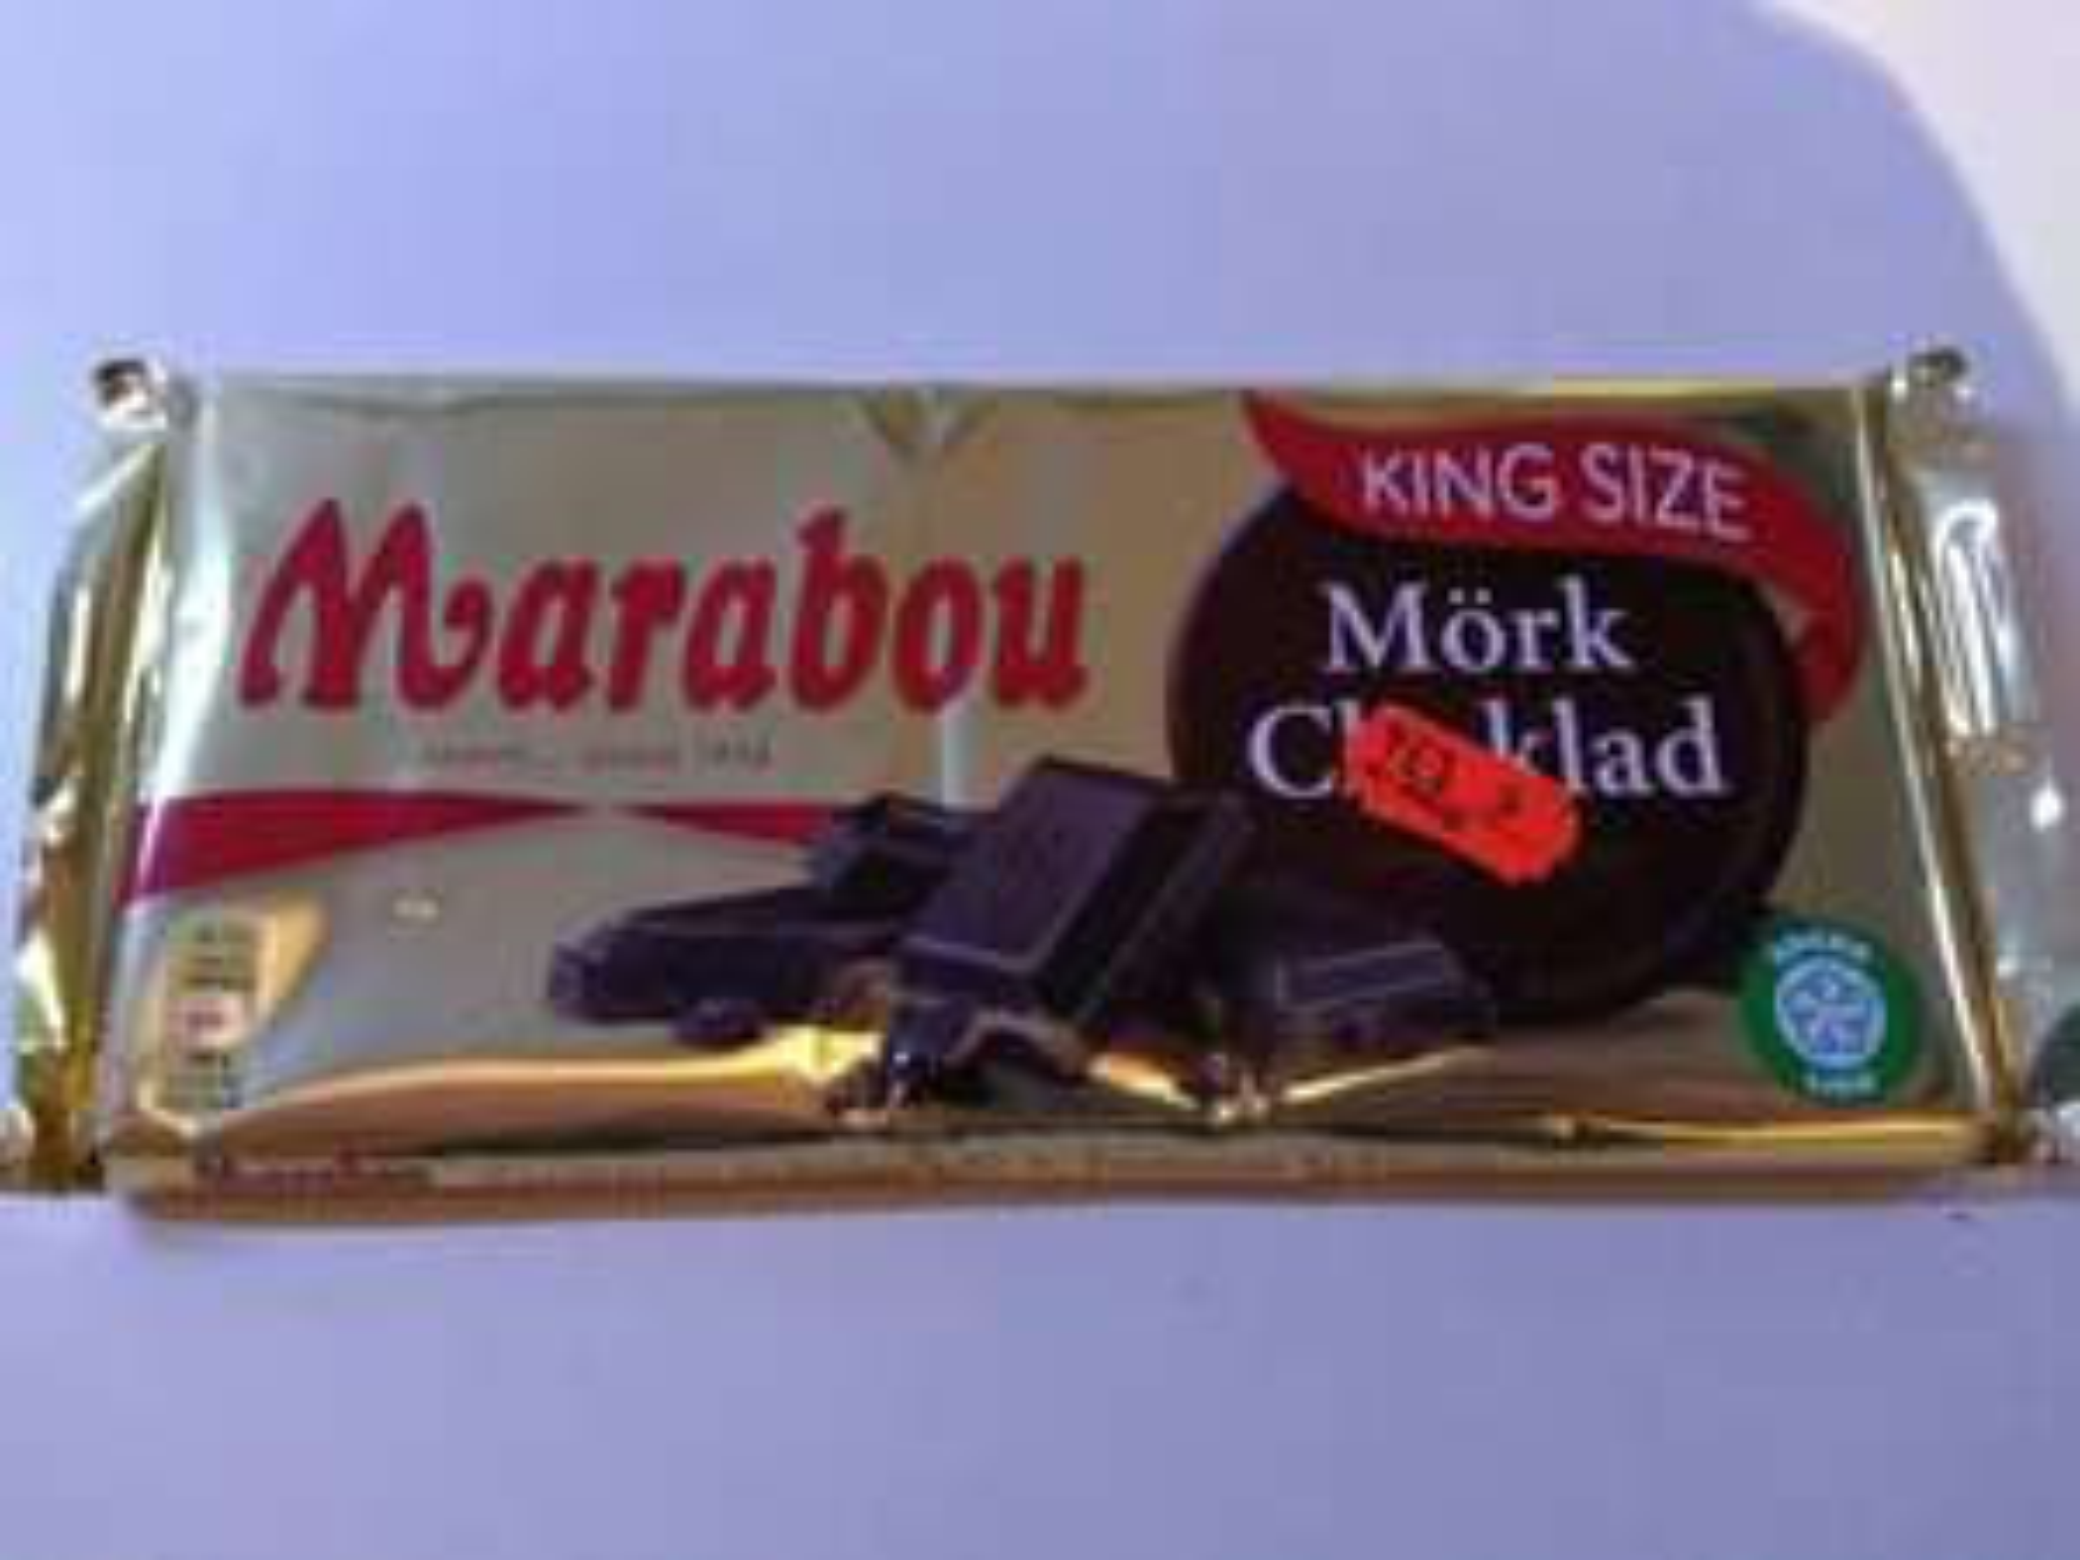 [Lokal - 25541 Brunsbüttel] verschiedene Sorten Marabou Schokolade 250gr. für je. 1,34€